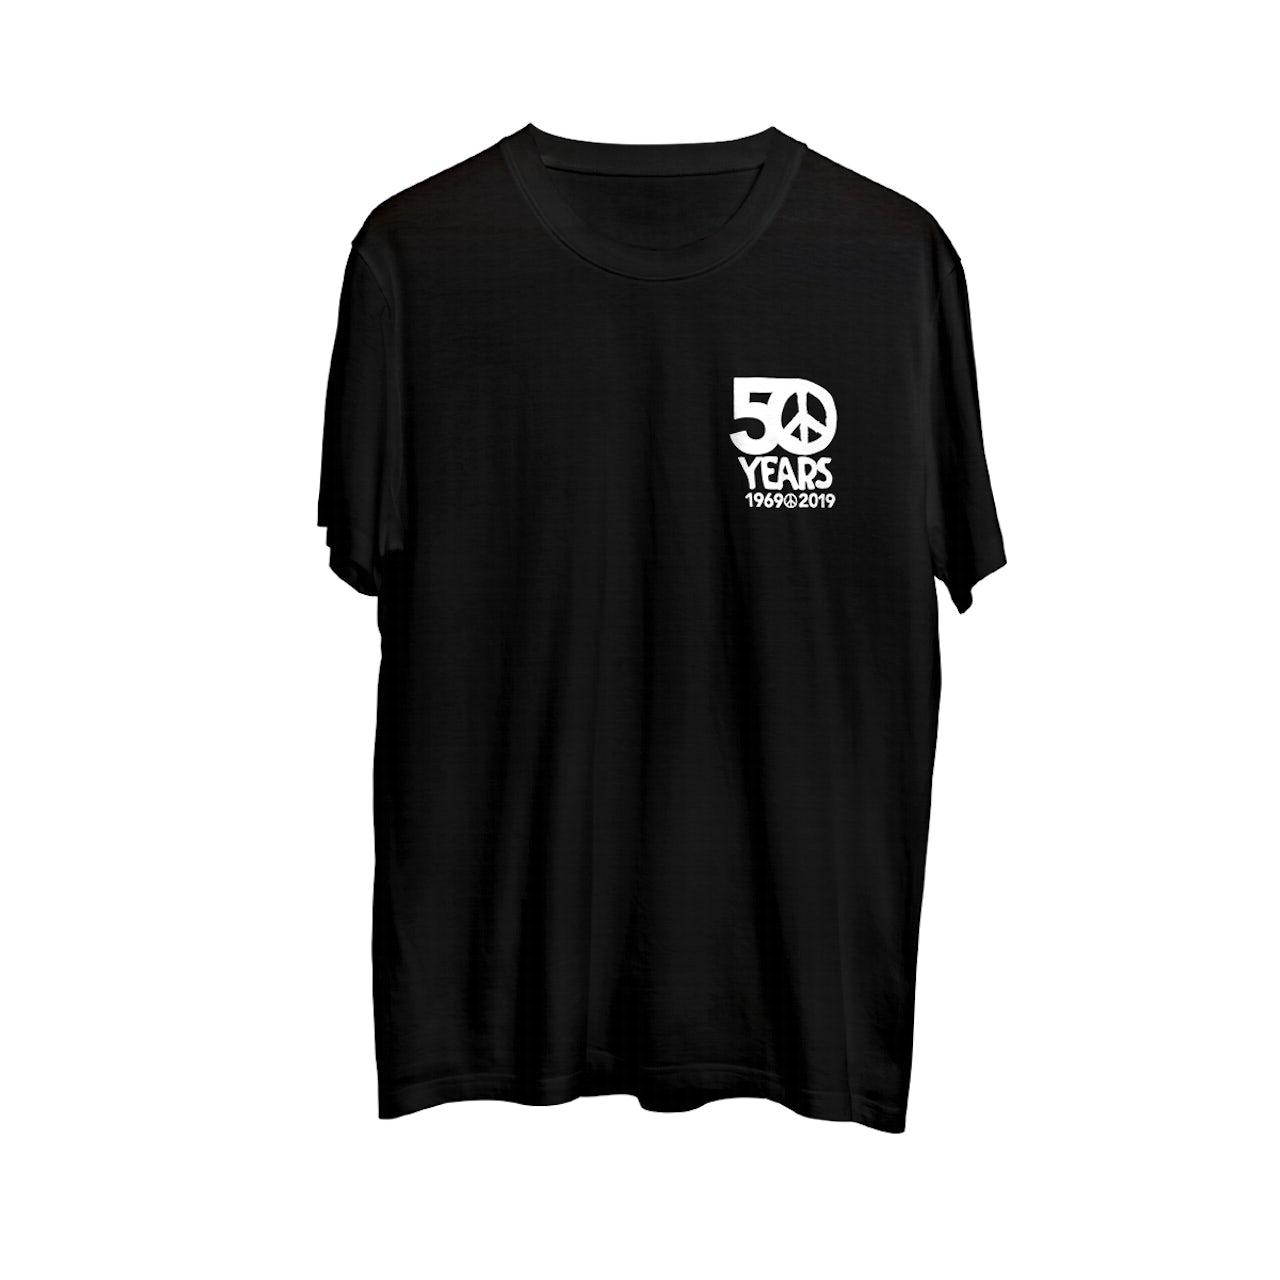 bcc3c1d172 Woodstock 50th Anniversary Black T-Shirt